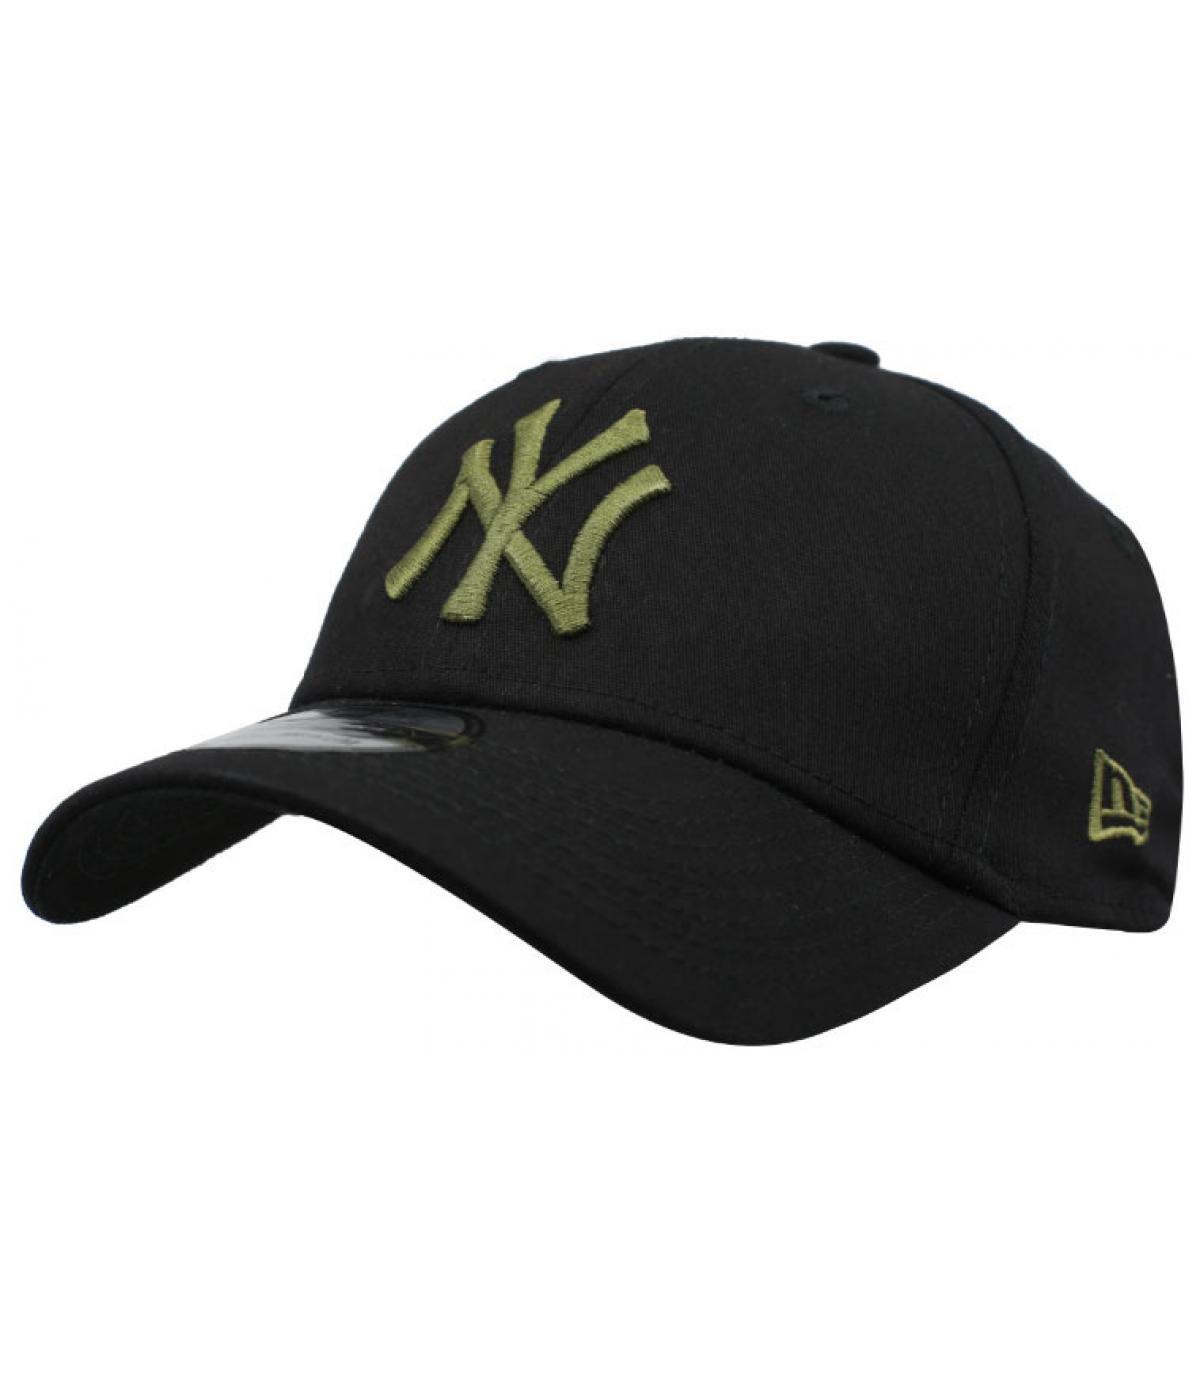 Dettagli League Ess NY 39Thirty black olive - image 2